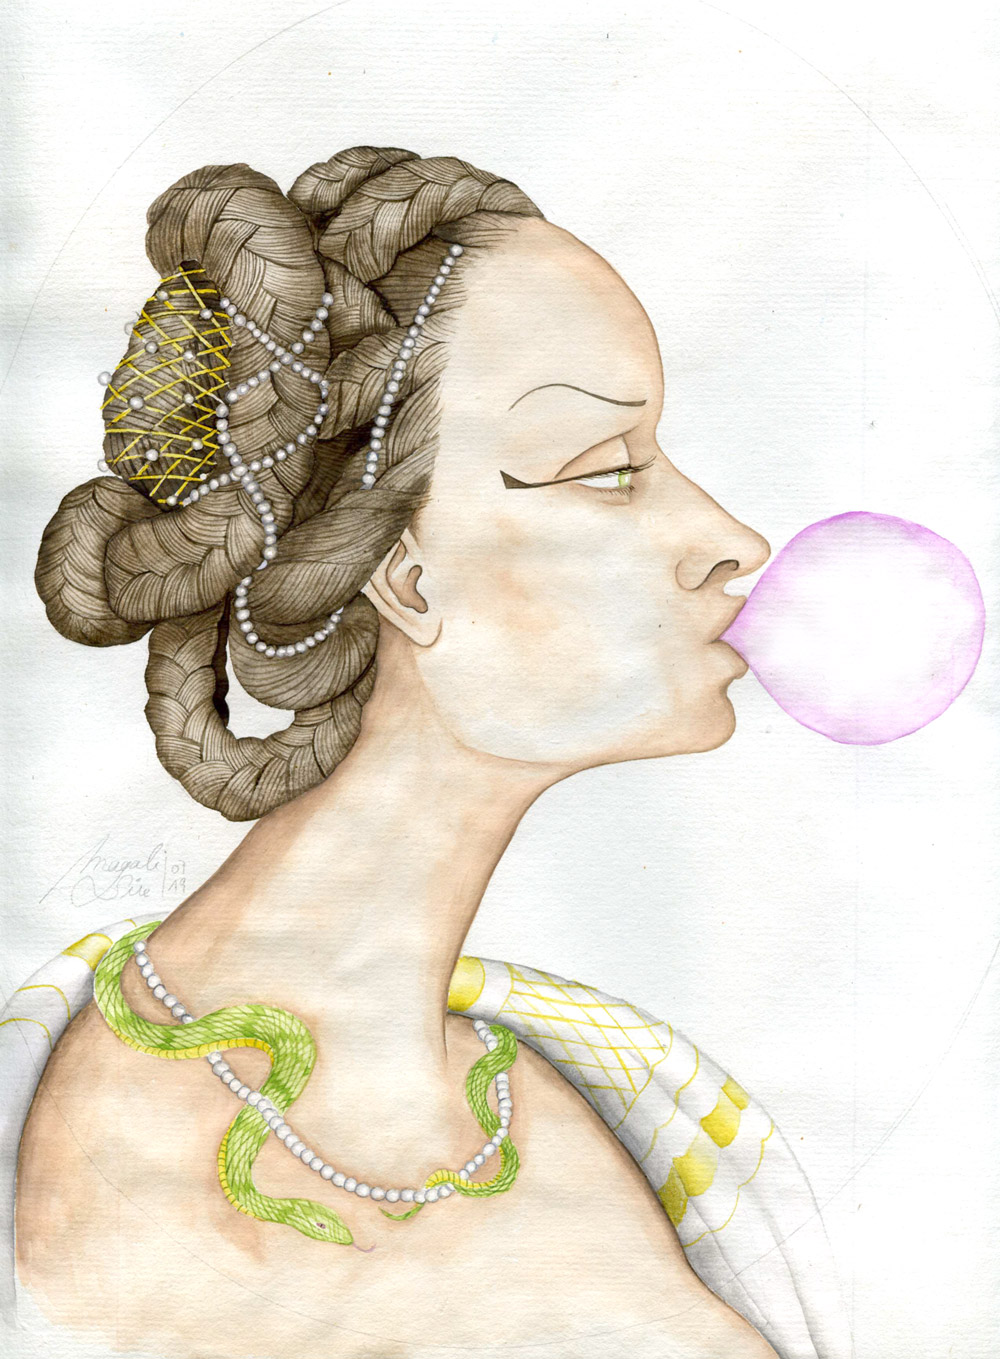 Cléopâtre et son malabar